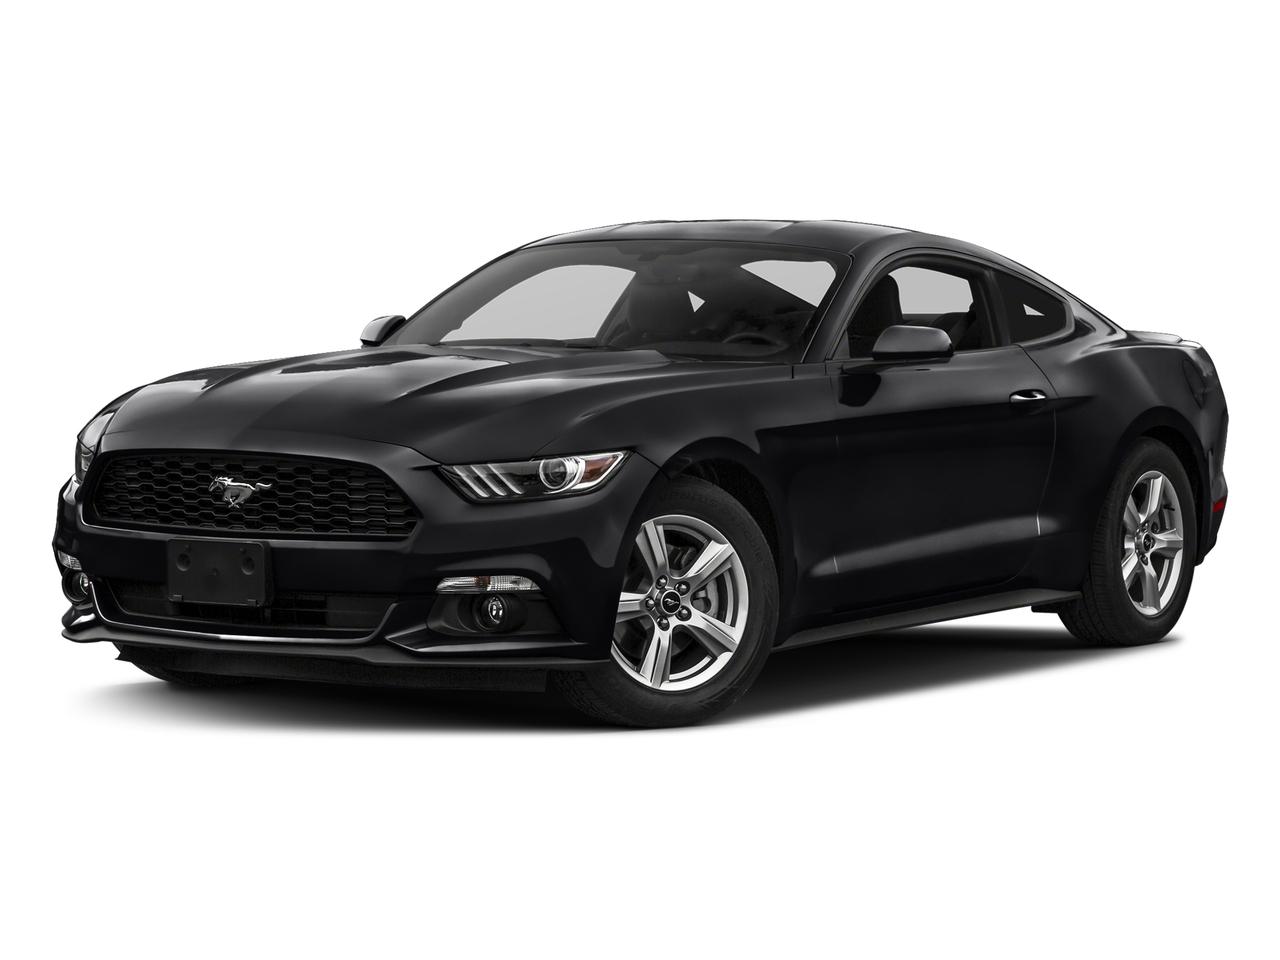 2017 Ford Mustang V6 2dr Car Slide